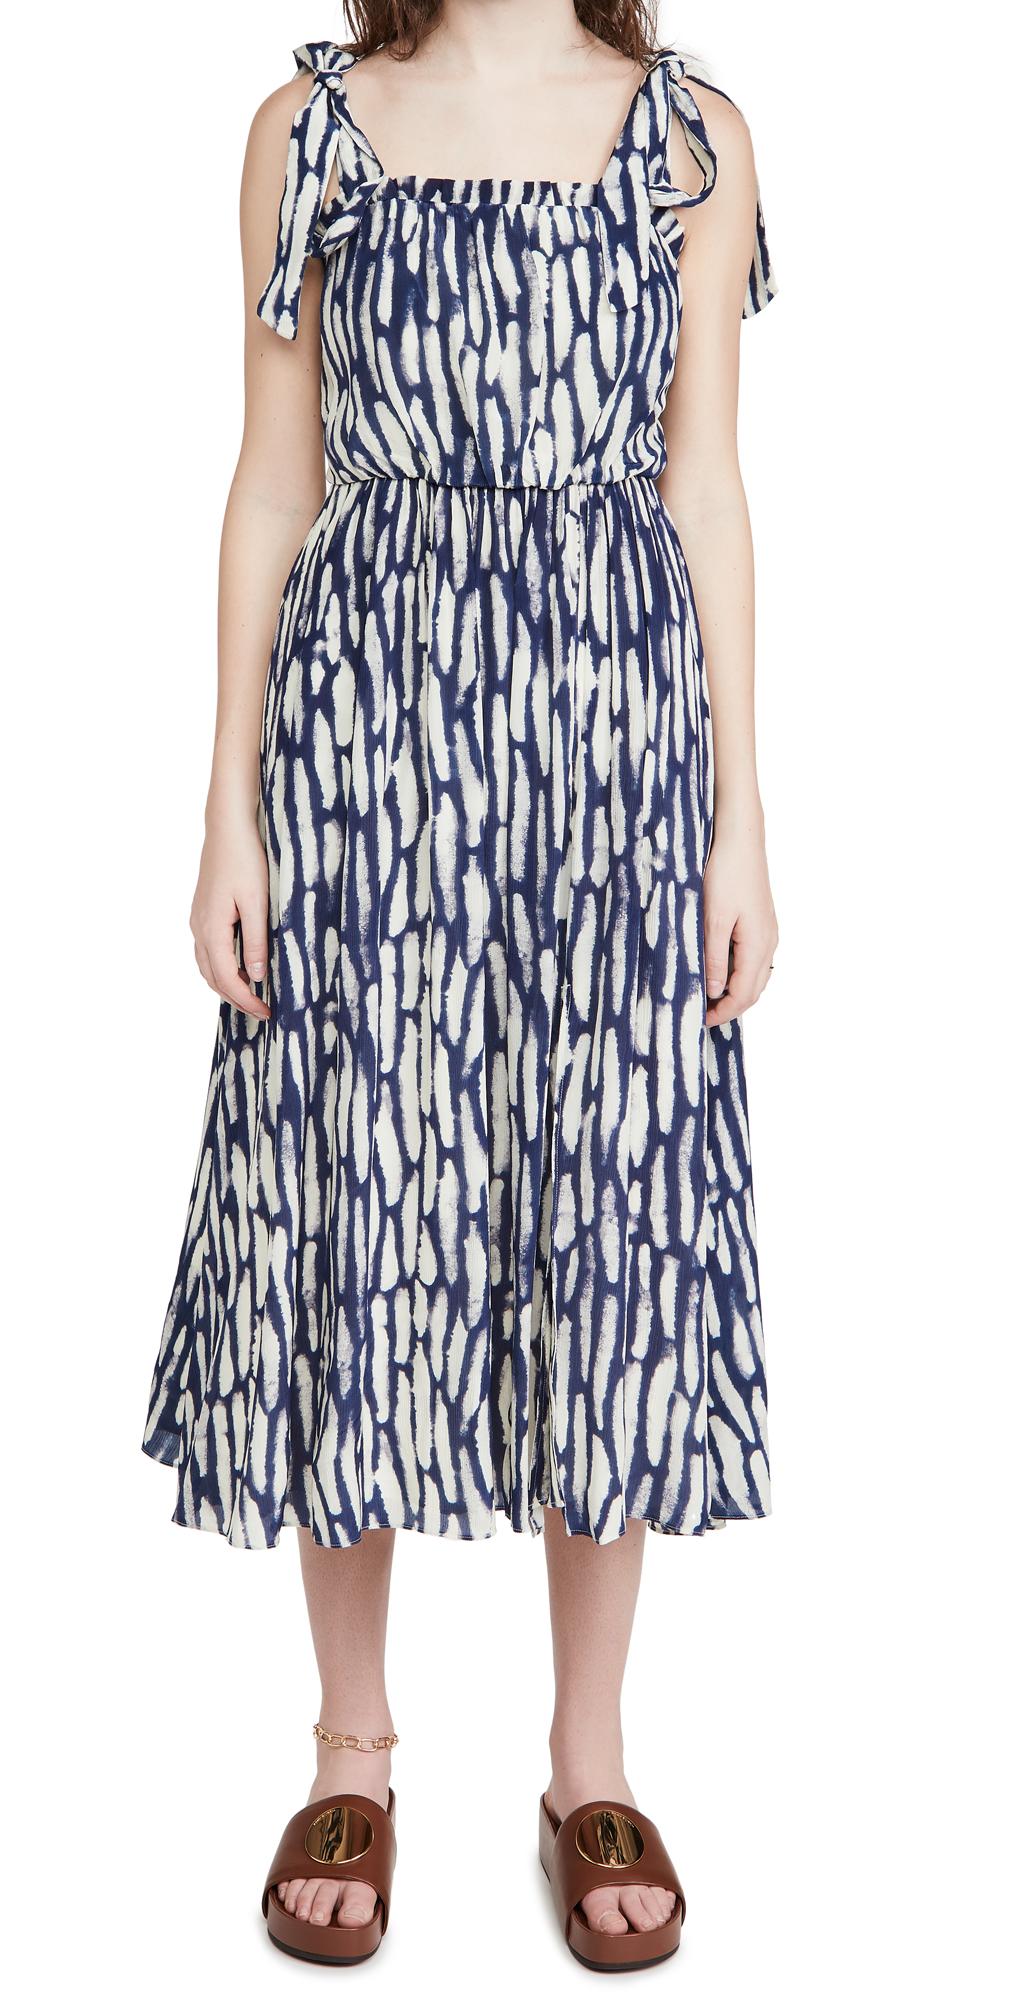 Jason Wu Sleeveless Dress with Shoulder Ties